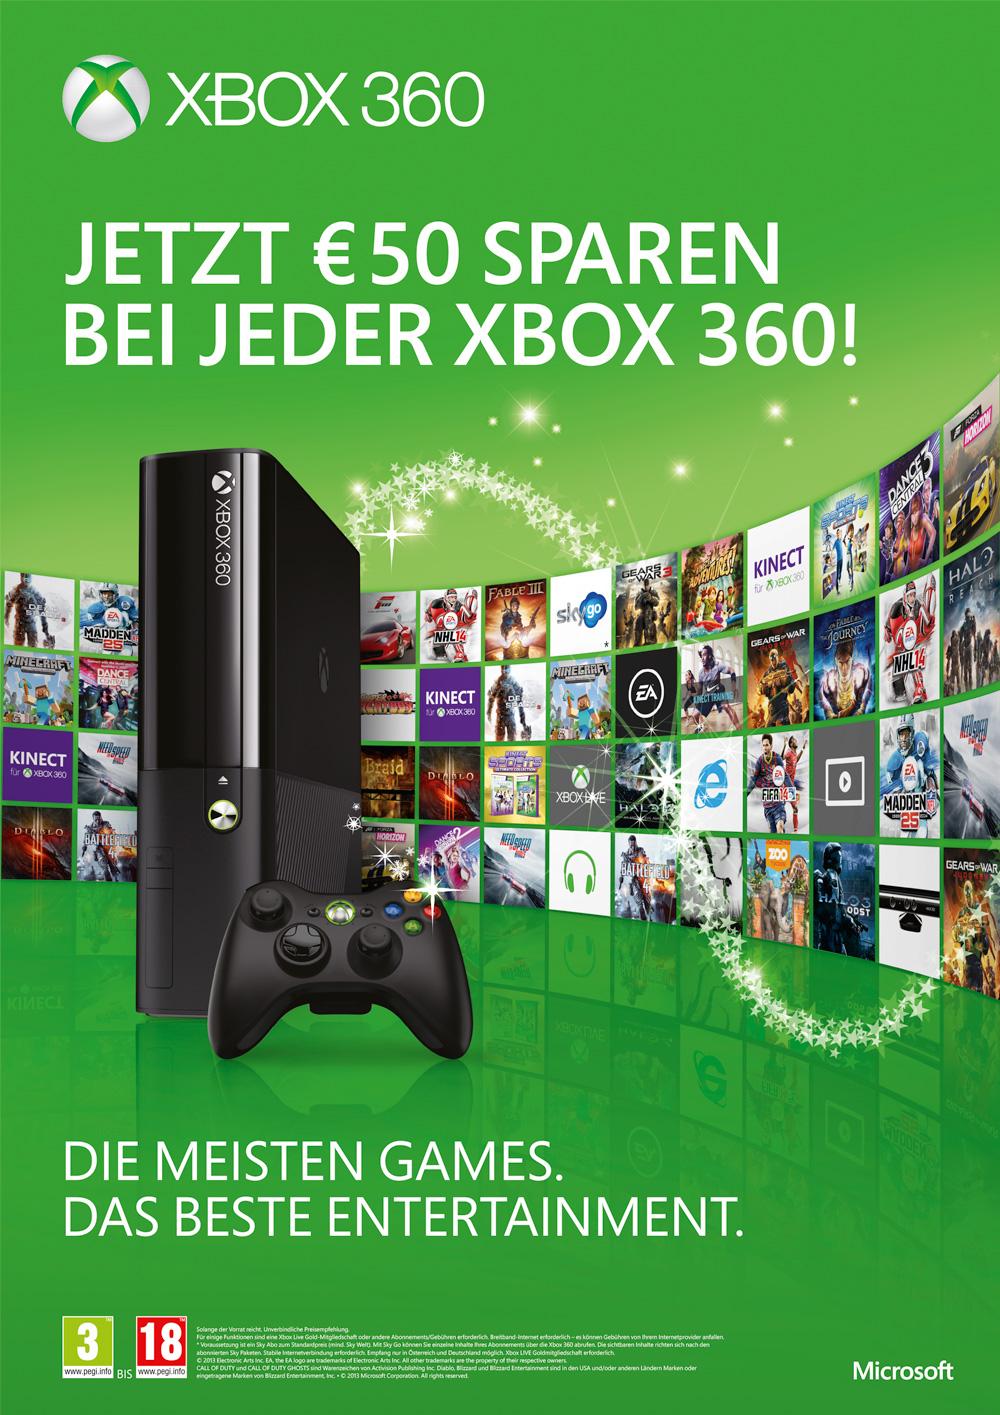 microsoft_poster_games.jpg